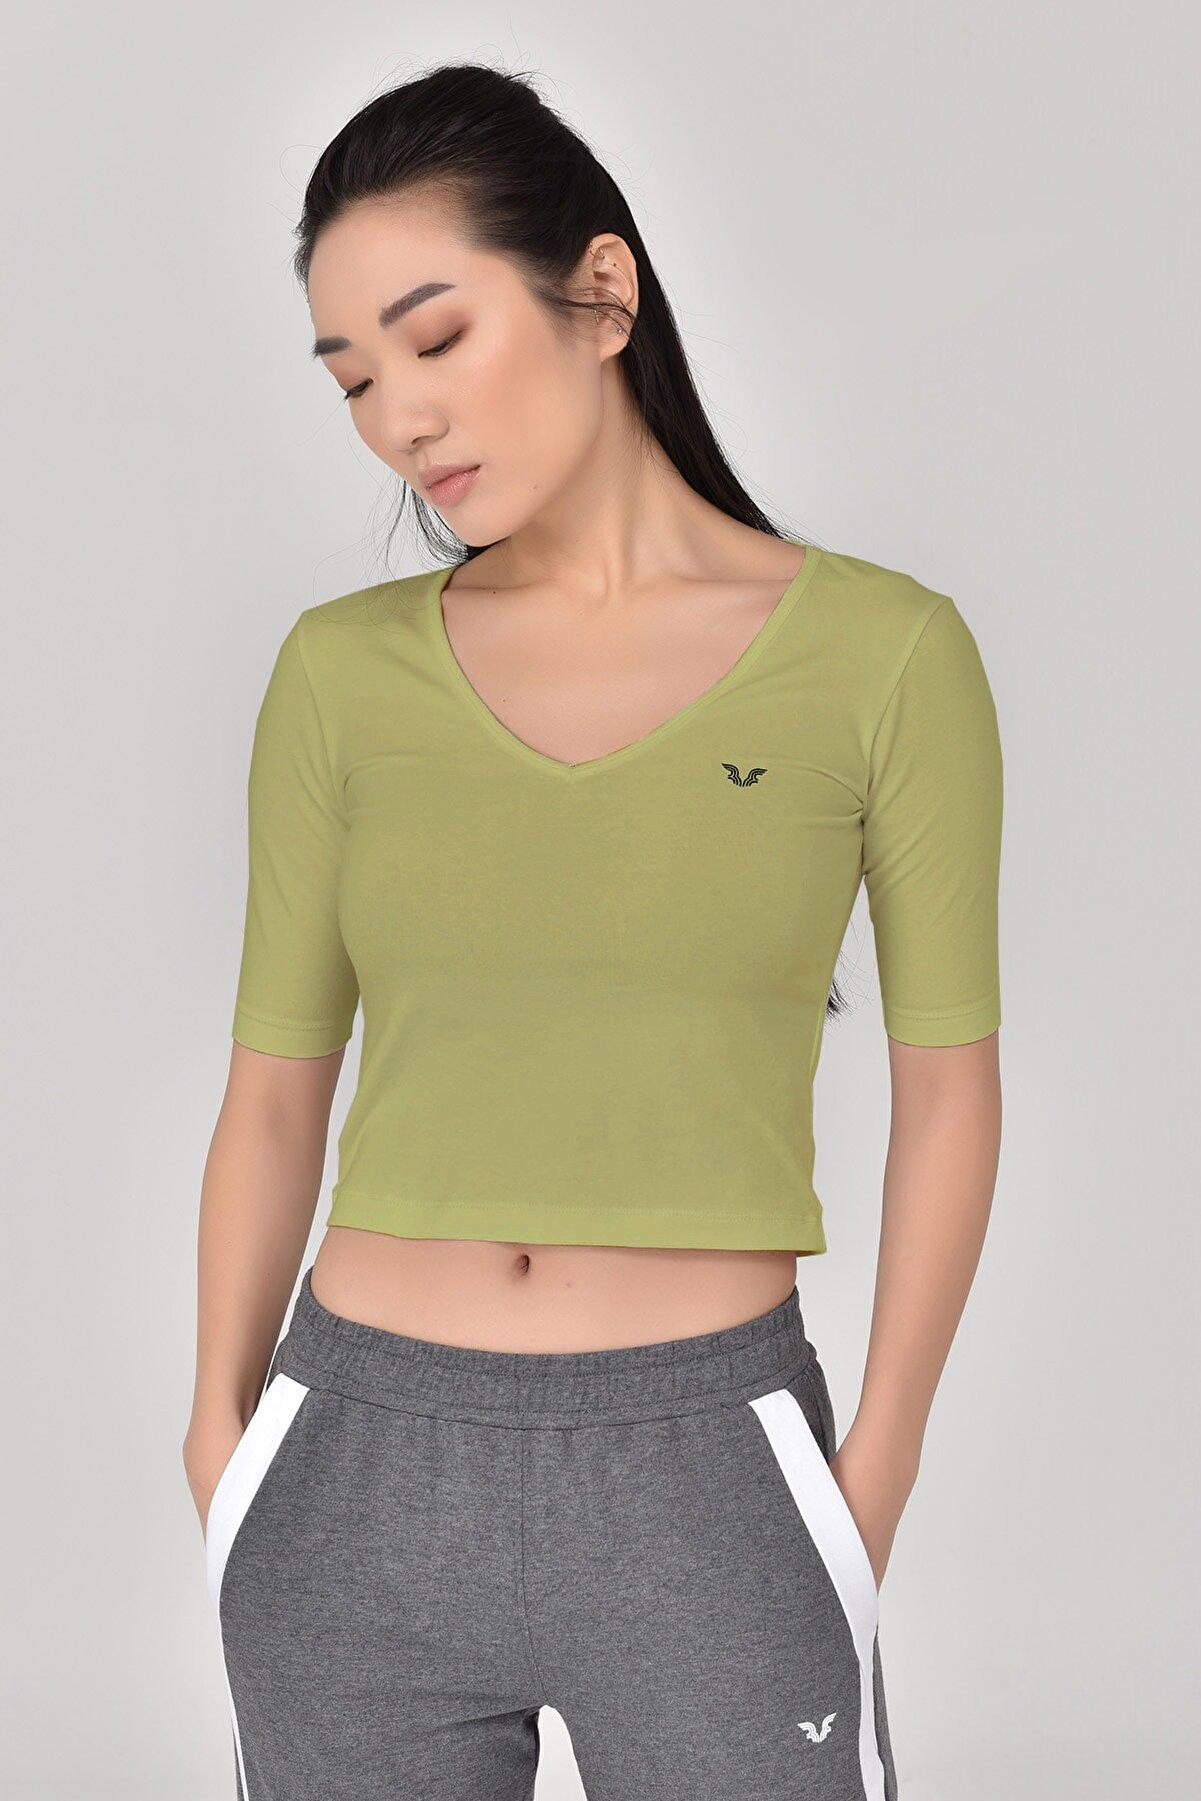 bilcee Kadın  A.yeşil Yoga T-shırt Gs-8105